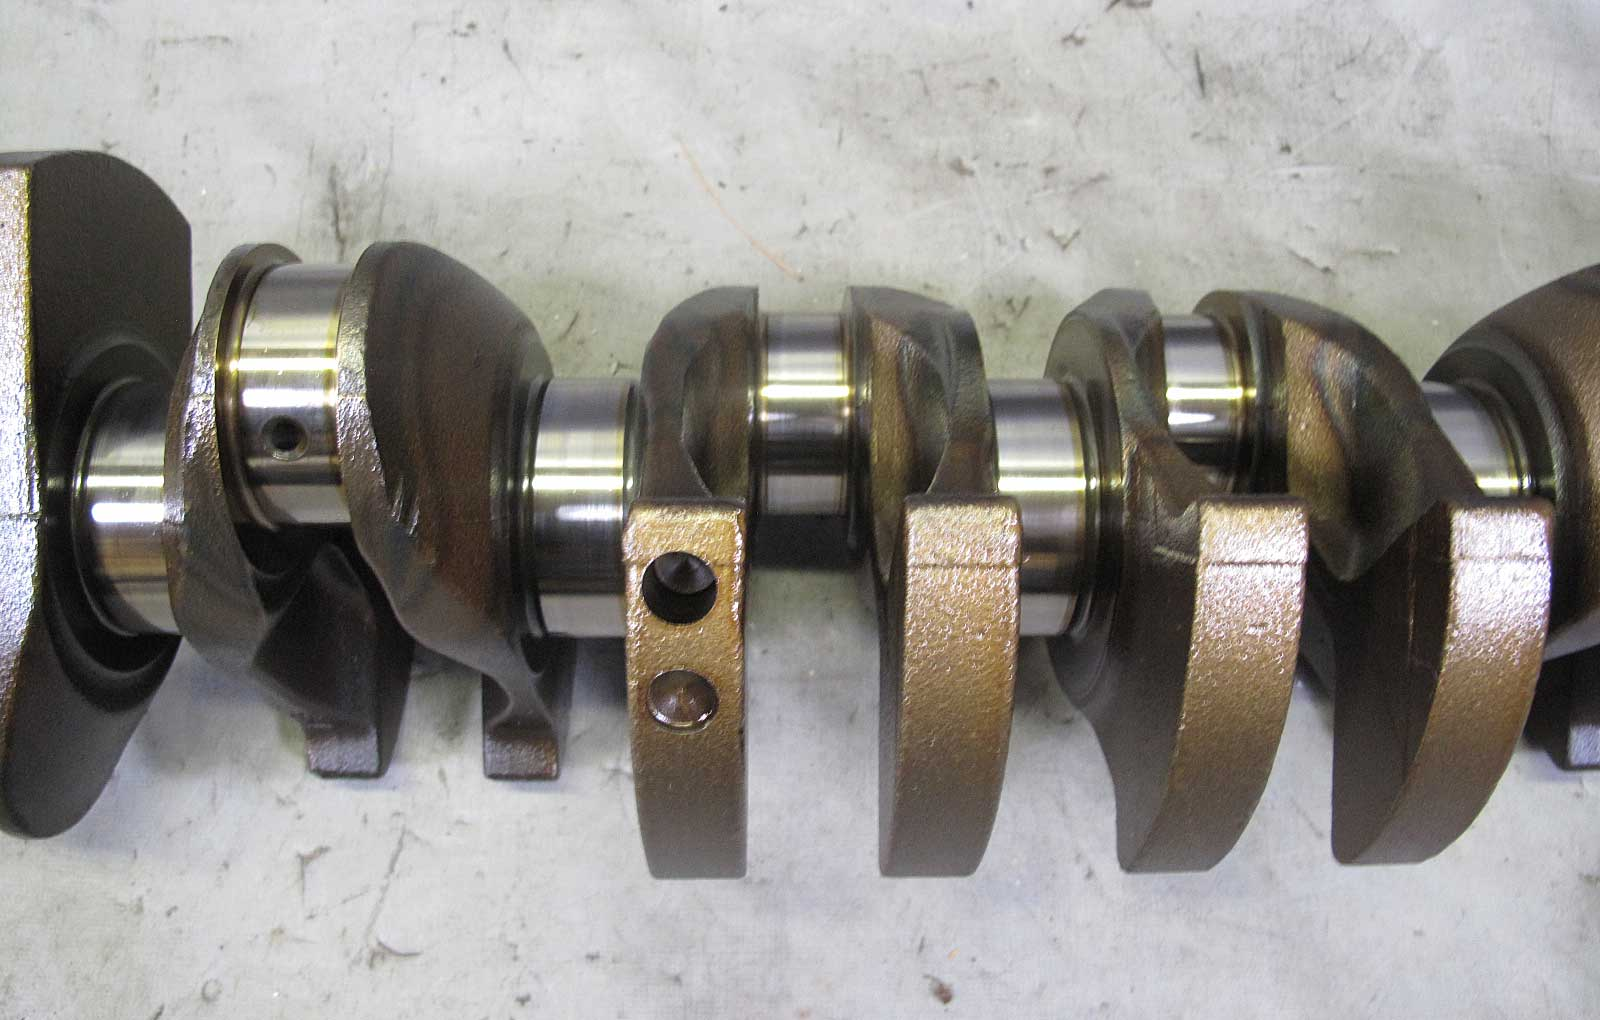 2006 2013 Bmw N52 3 0l 6 Cylinder Engine Crankshaft Crank